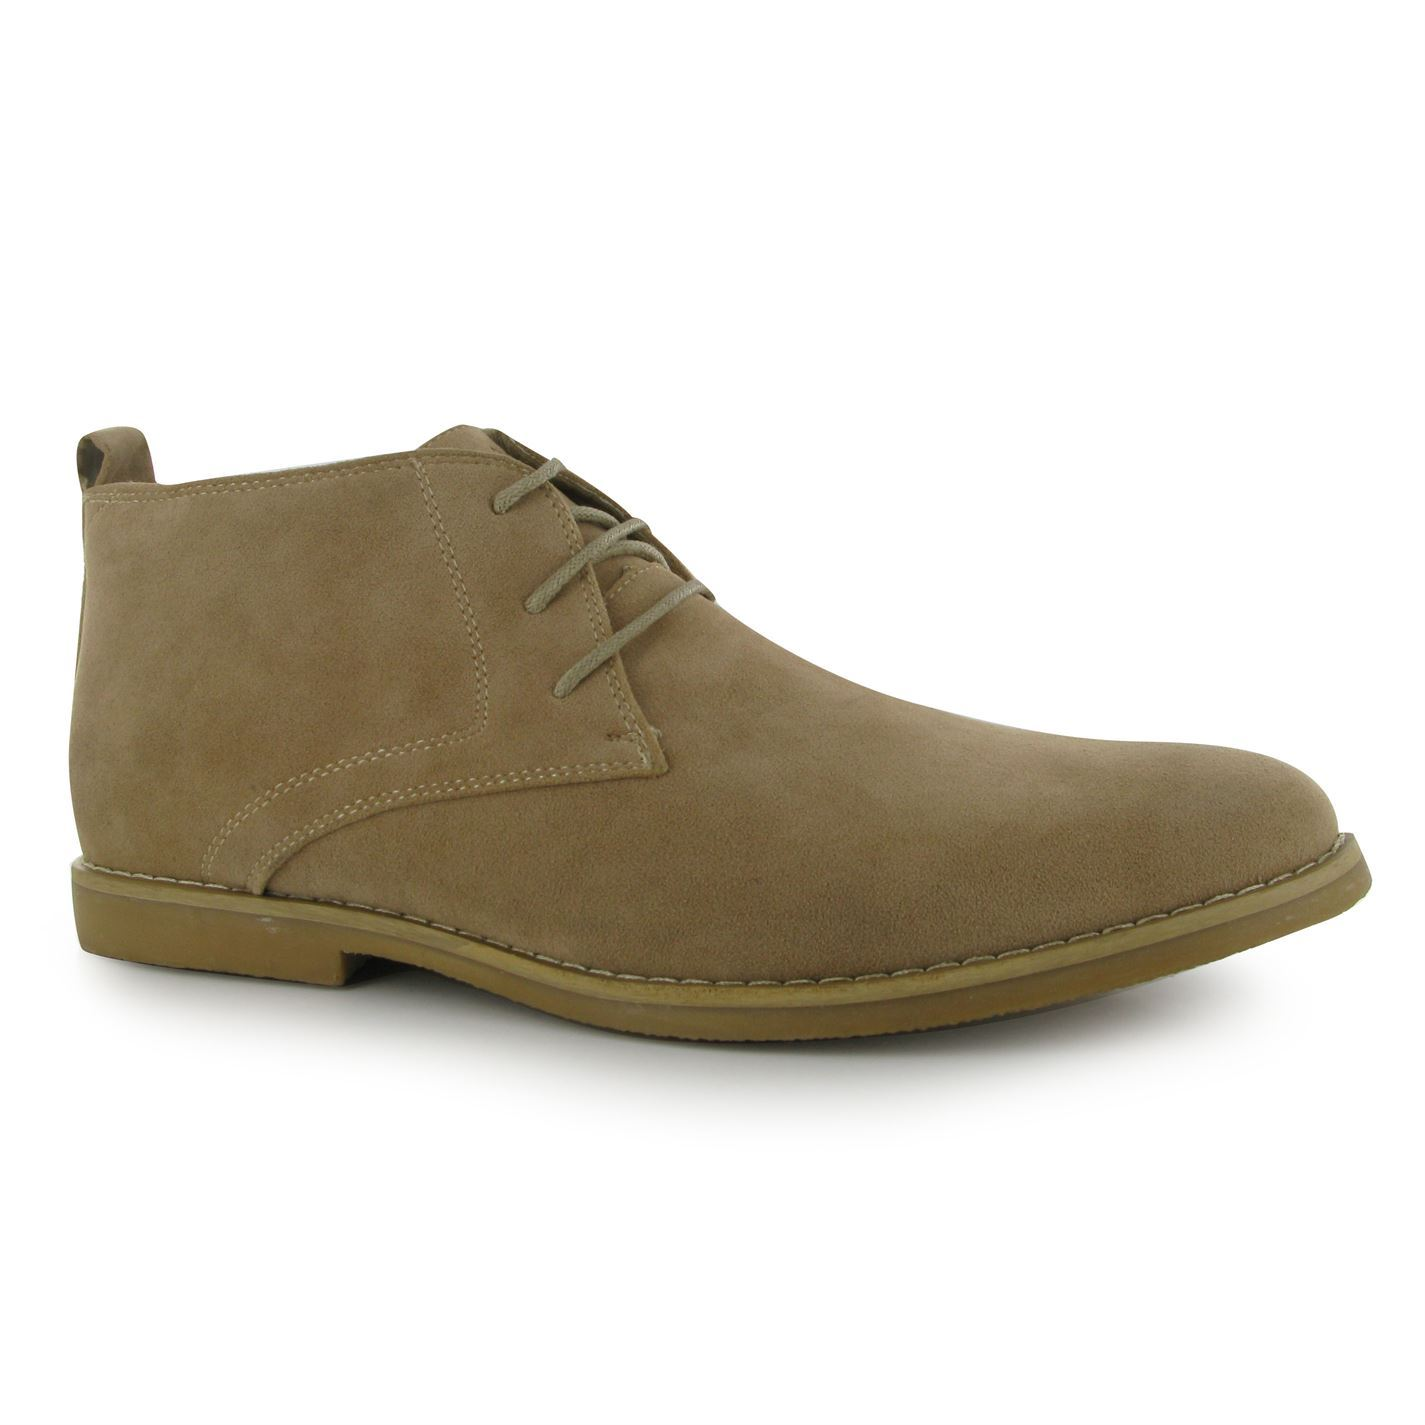 Lee Cooper Mens C FS Viva Boots Slip On Shoes Casual ...